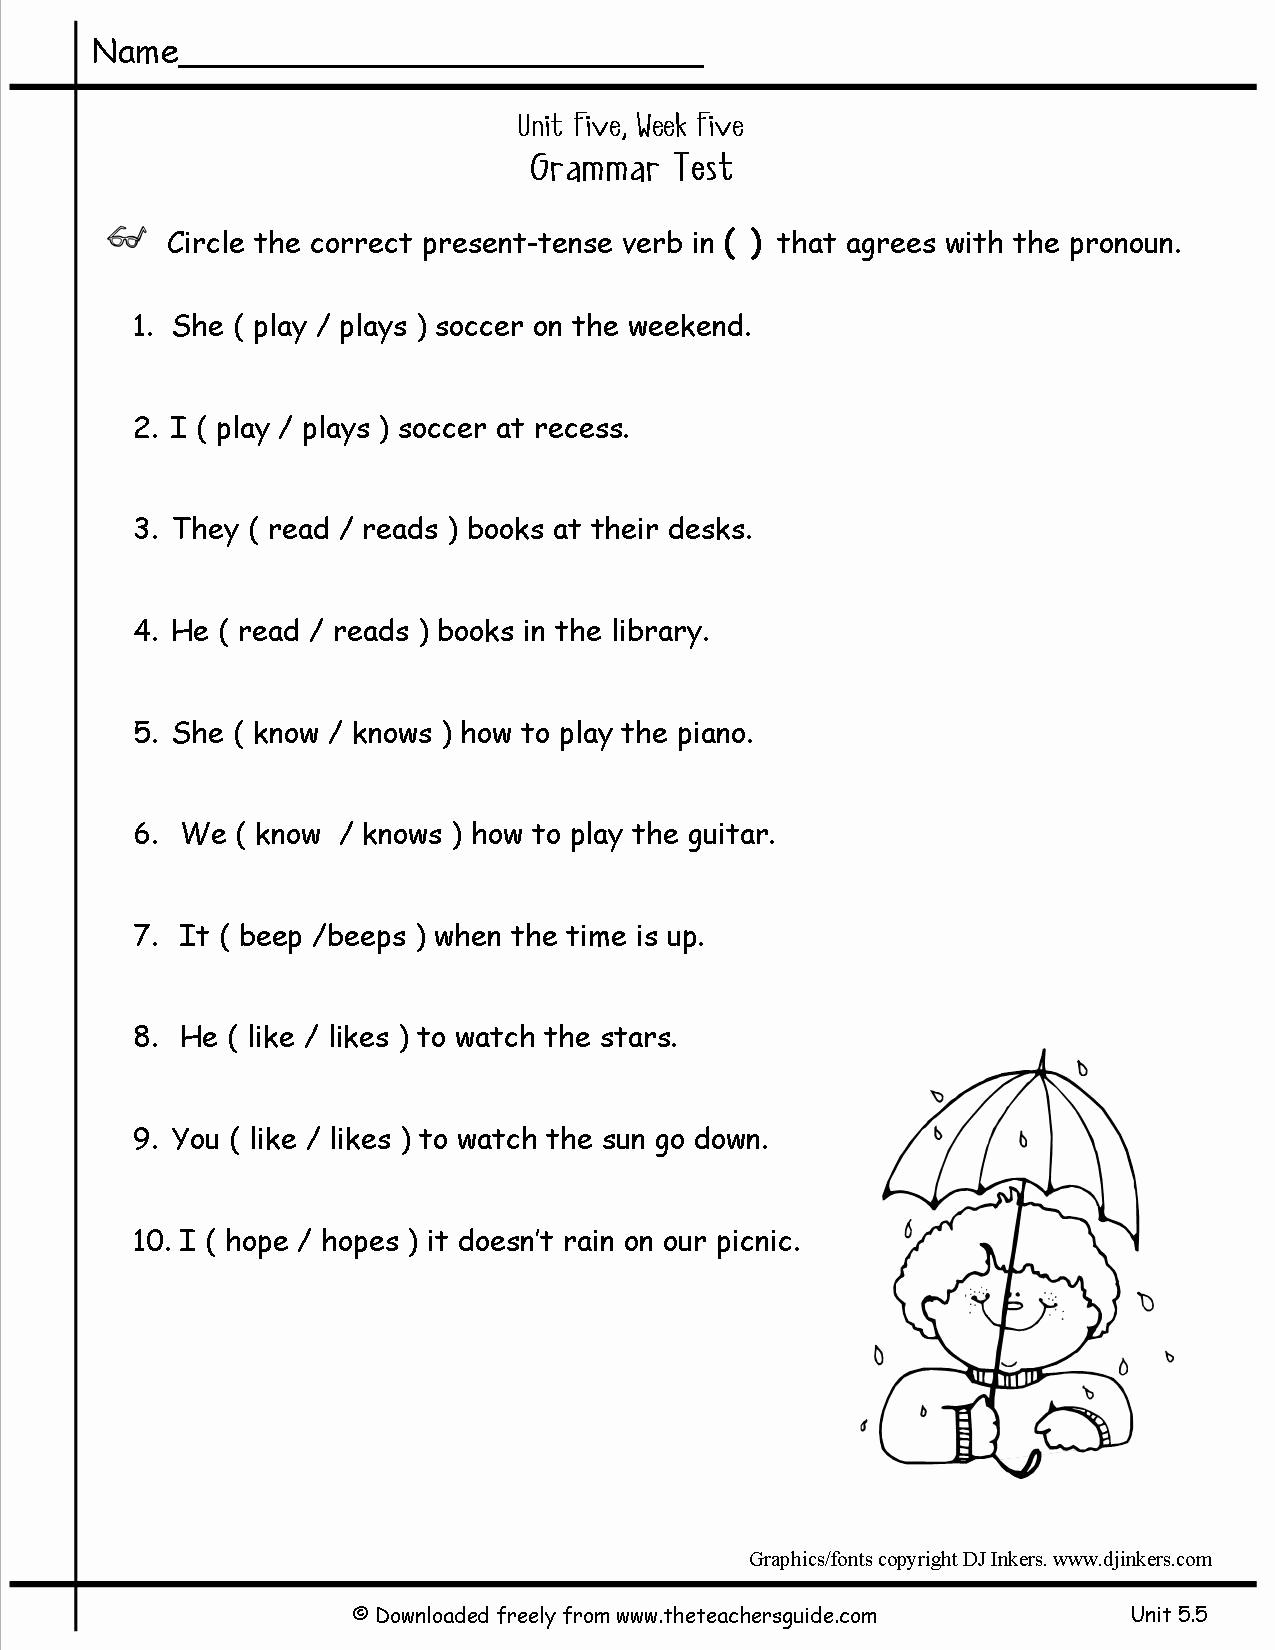 Pronoun Worksheets 2nd Grade Beautiful 9 Best Of Pronoun Antecedent Agreement Worksheets